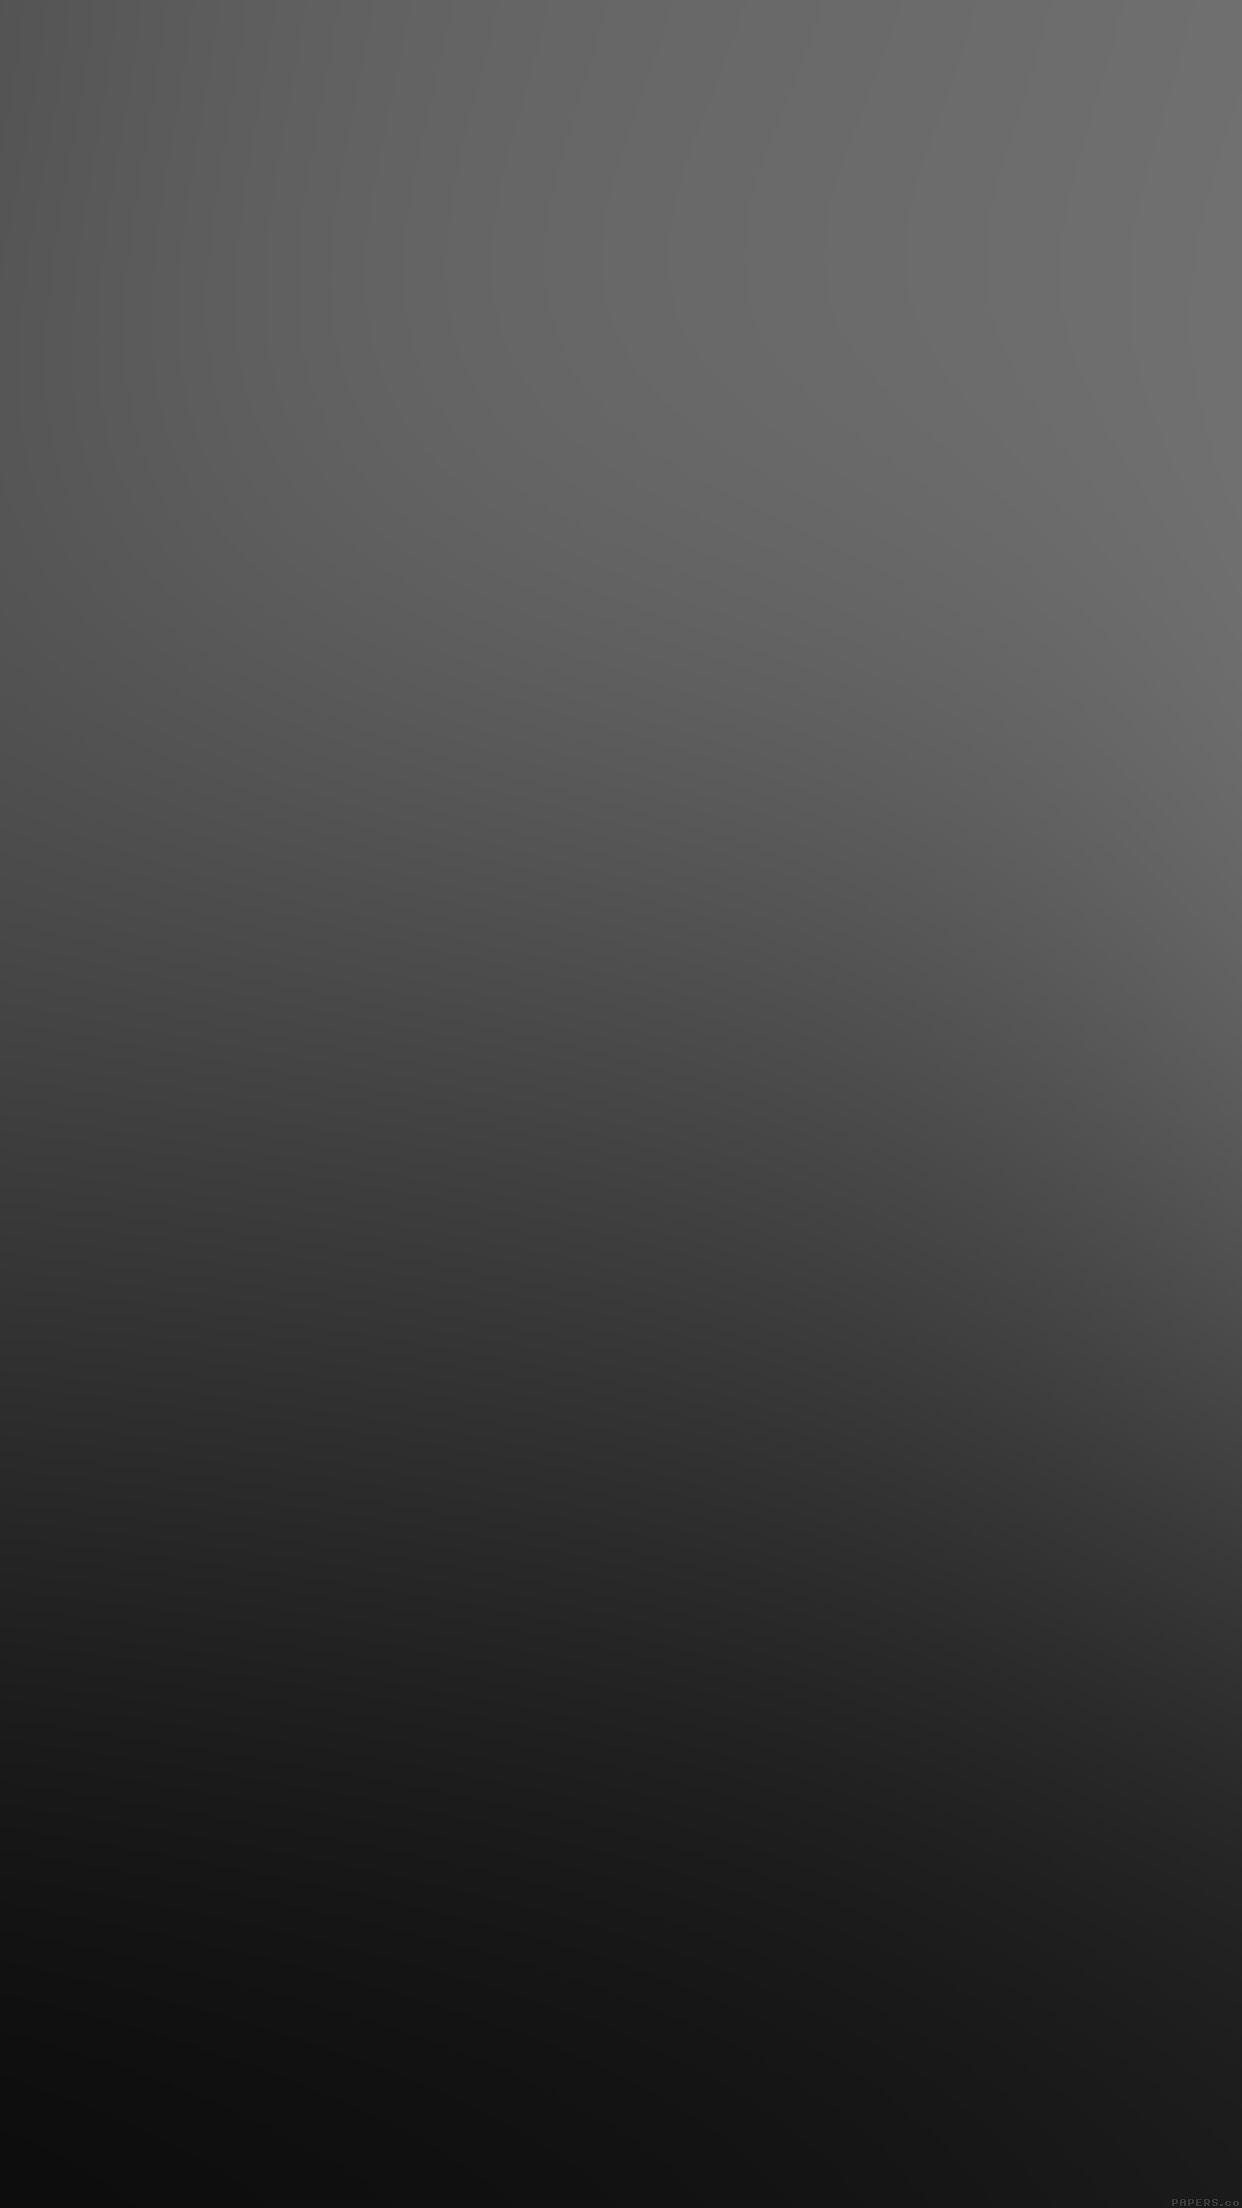 Dark Gray Iphone  Plus Wallpaper Best Wallpaper Hd